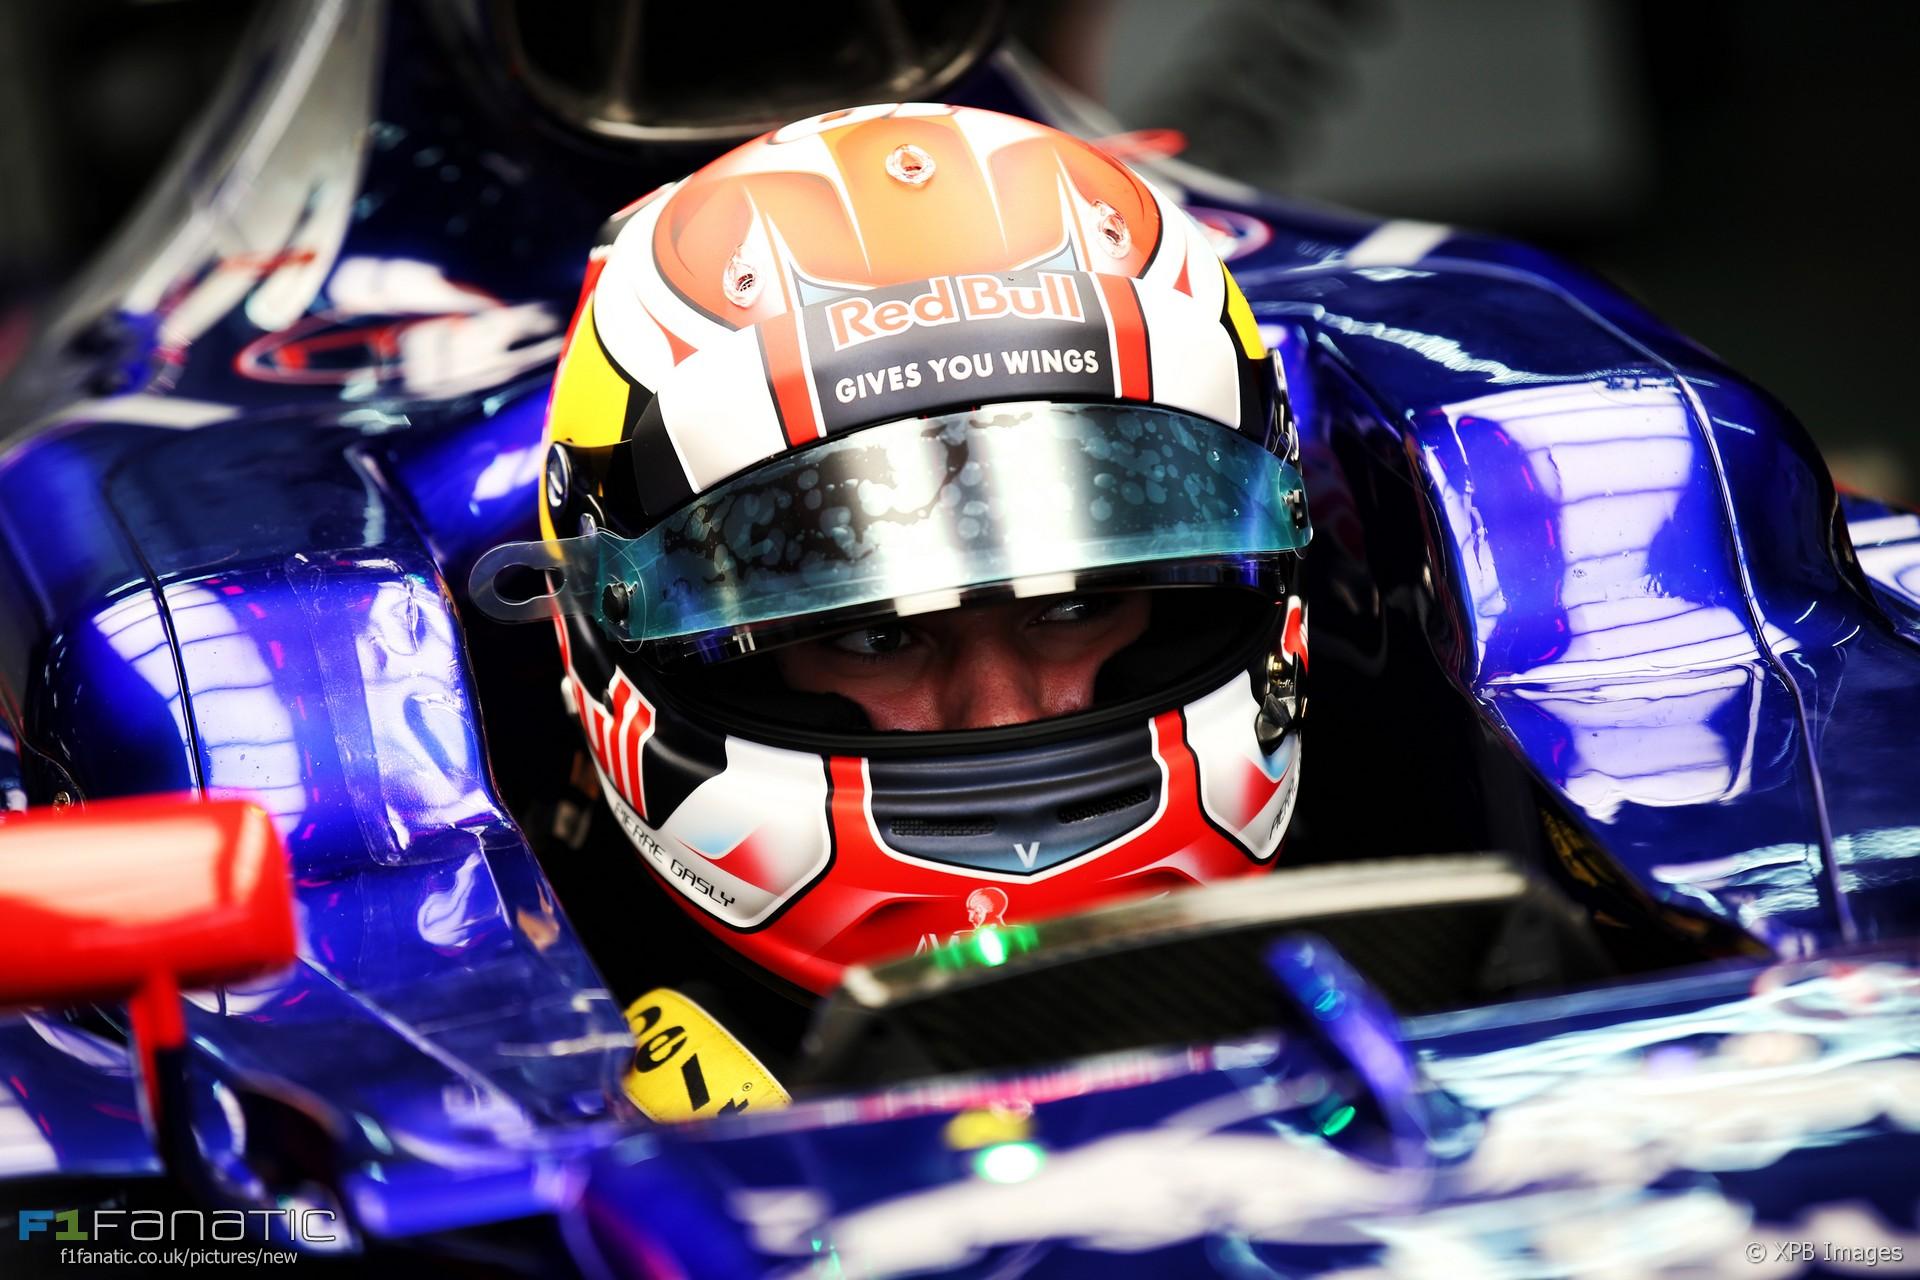 Pierre Gasly, Toro Rosso, Sepang International Circuit, 2017